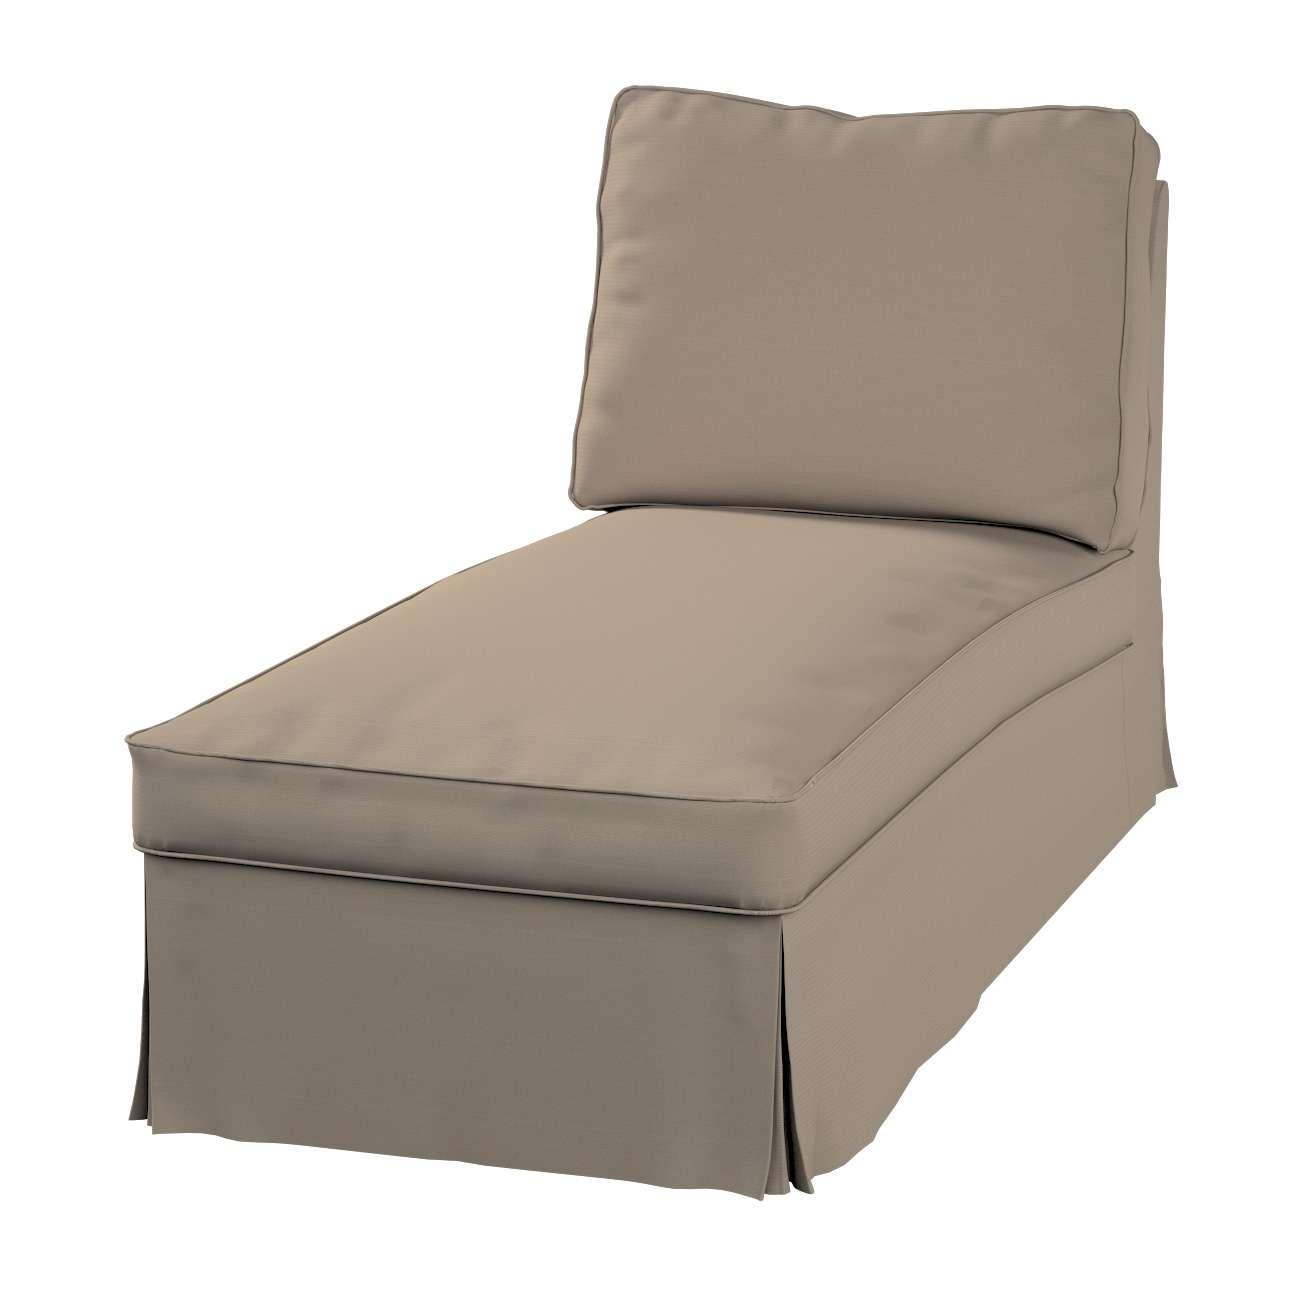 Ektorp chaiselong uden armlæn med ret ryg fra kollektionen Cotton Panama, Stof: 702-28